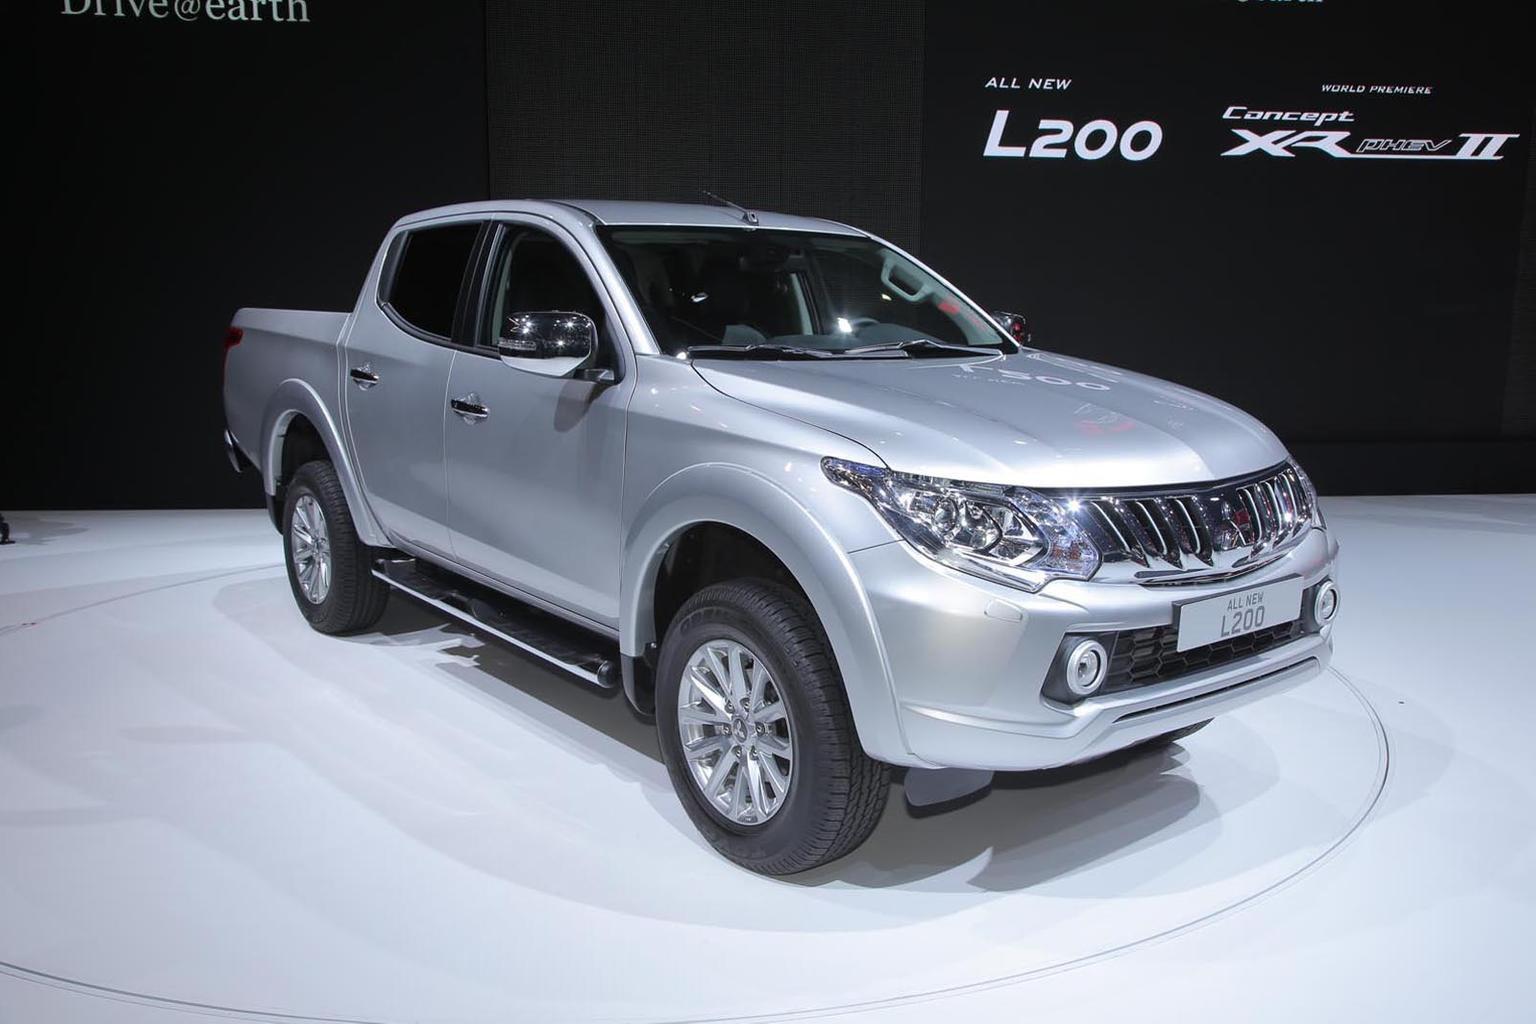 2015 Mitsubishi L200 revealed